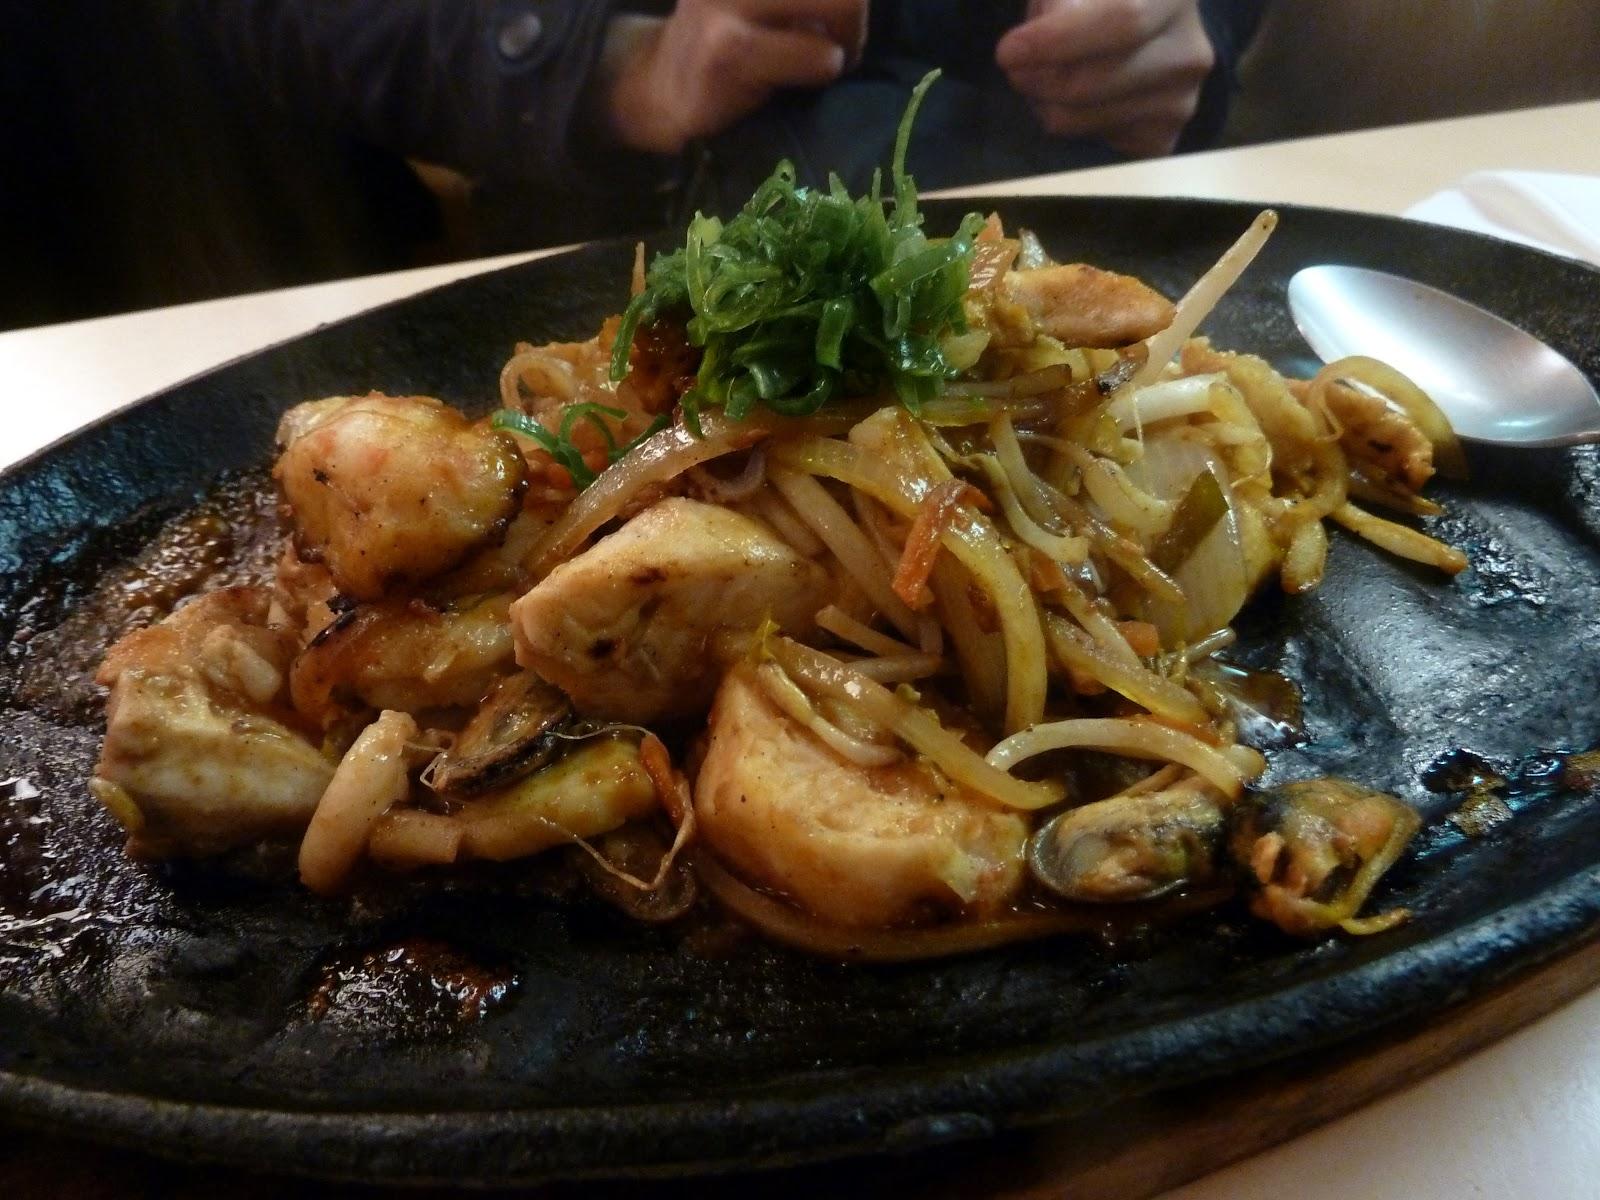 Yamato japanese restaurant corrs lane melbourne my for Asian cuisine melbourne